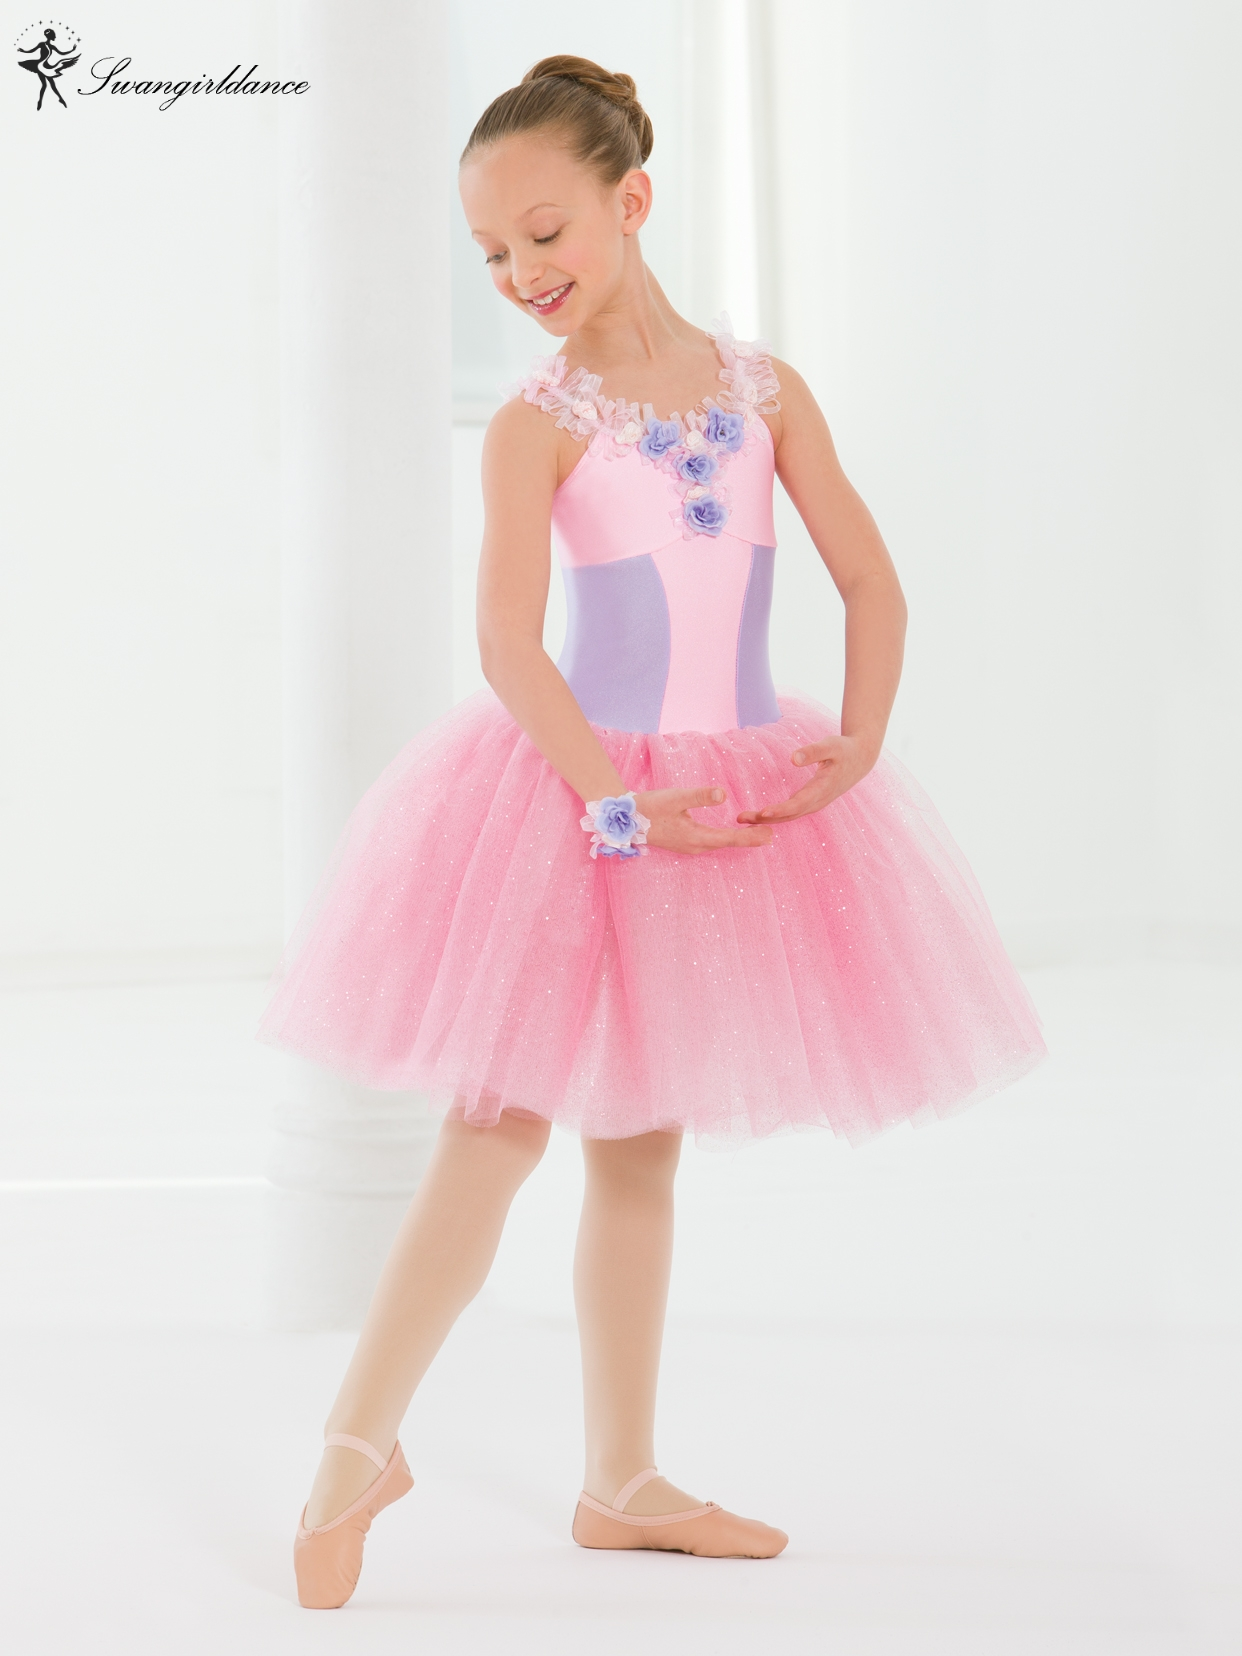 Encantador Vestidos De Baile Norfolk Ornamento - Colección de ...